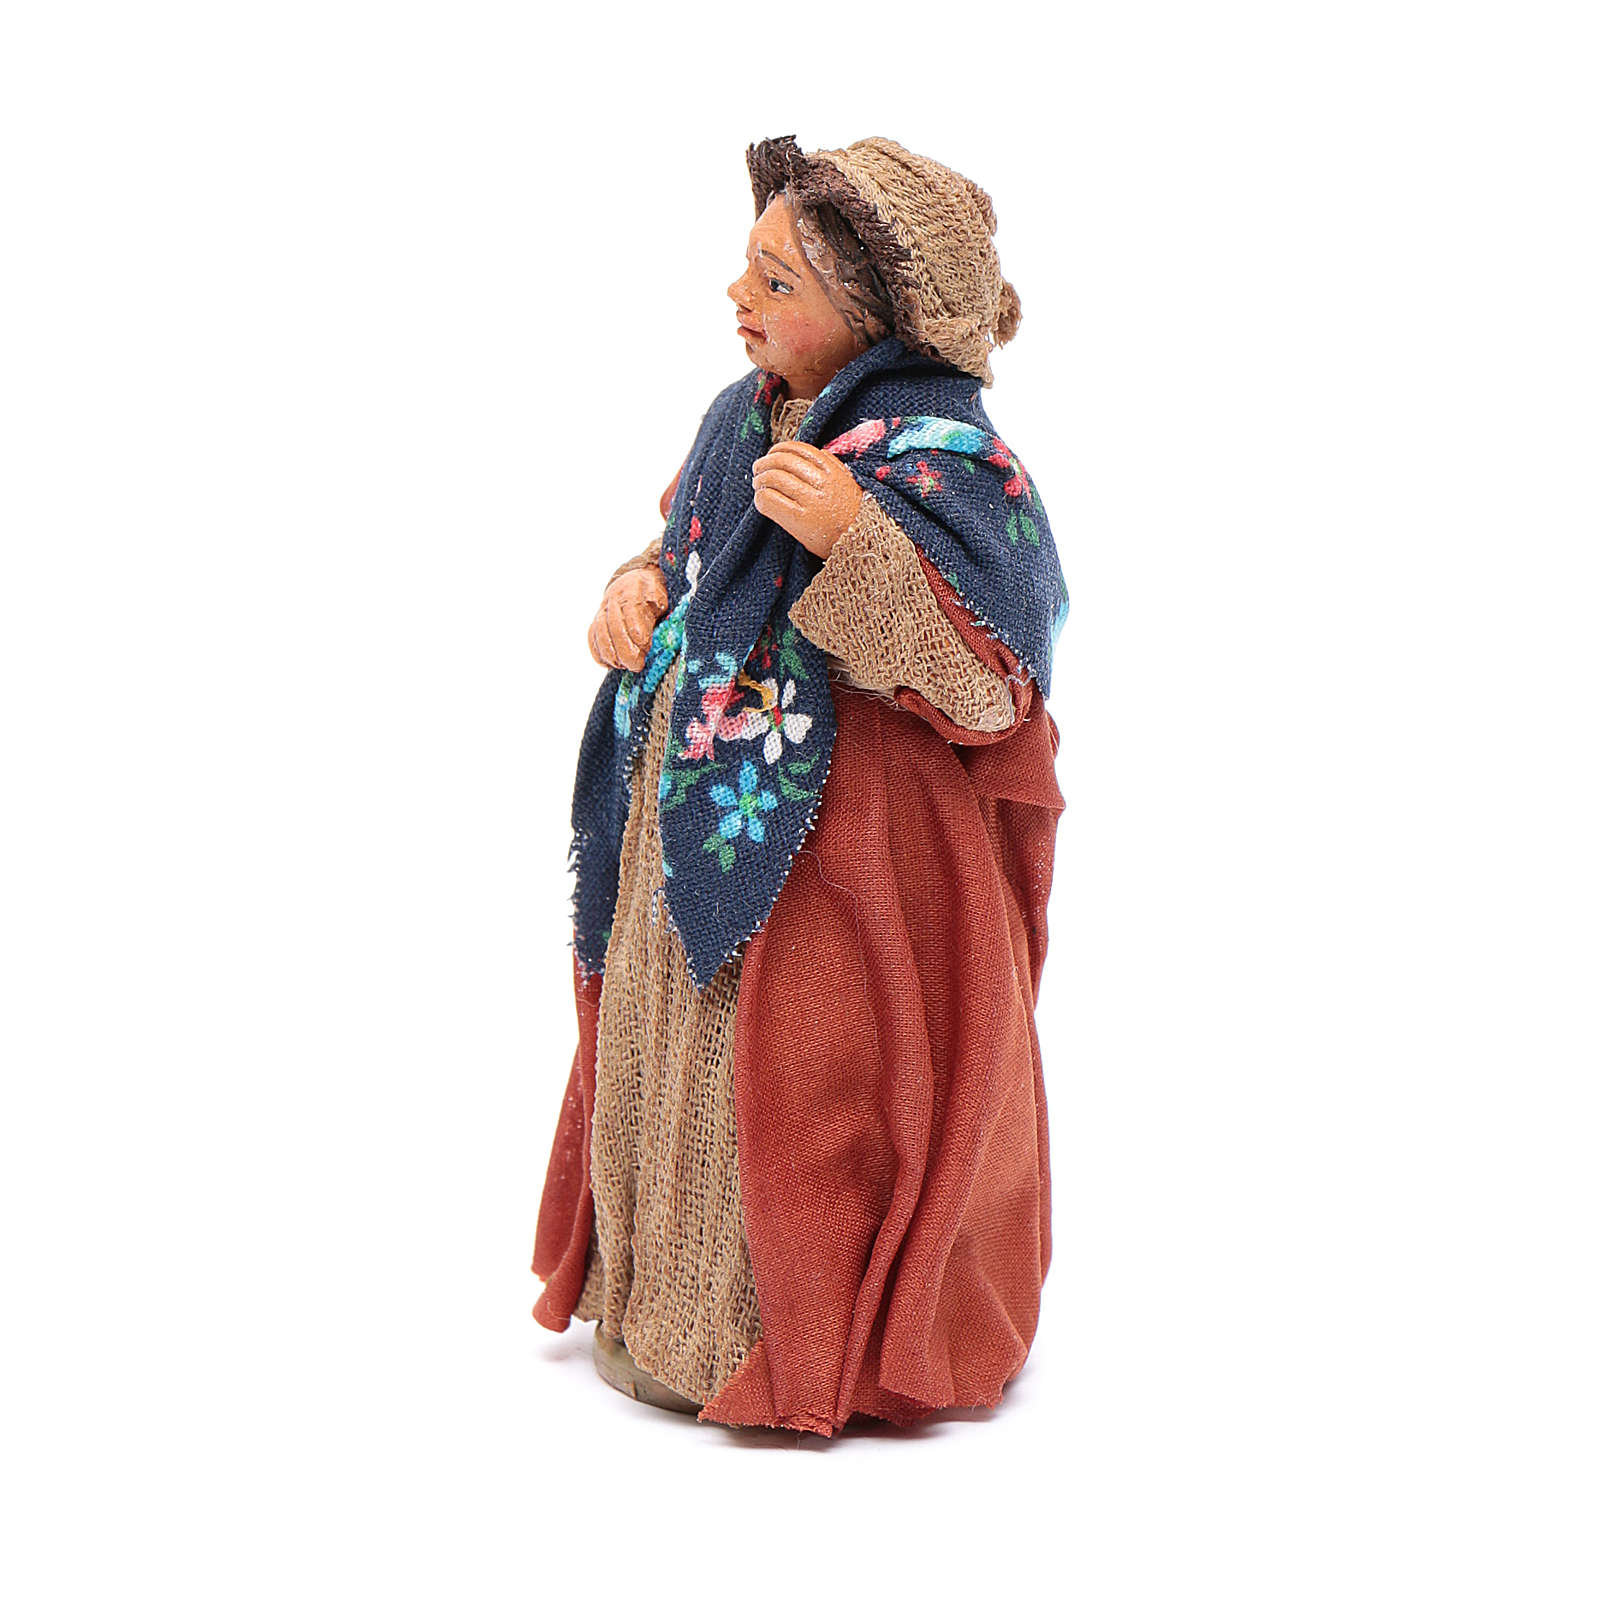 Mujer embarazada 10 cm Belén Napolitano 4